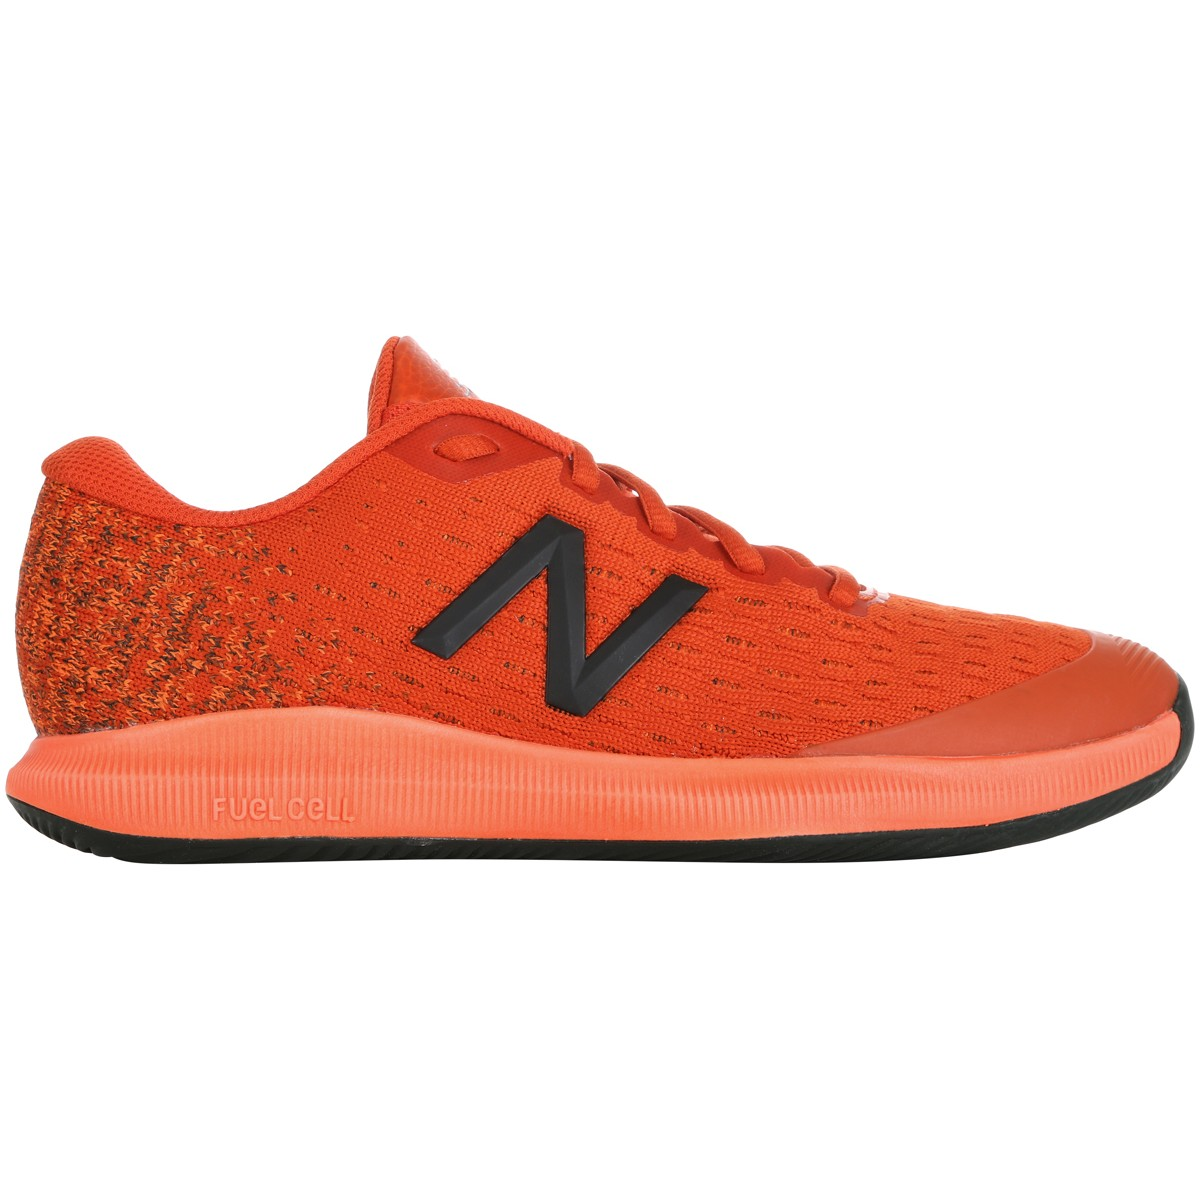 NEW BALANCE 996 V4 ALL COURT SHOES - NEW BALANCE - Men's - Shoes ...